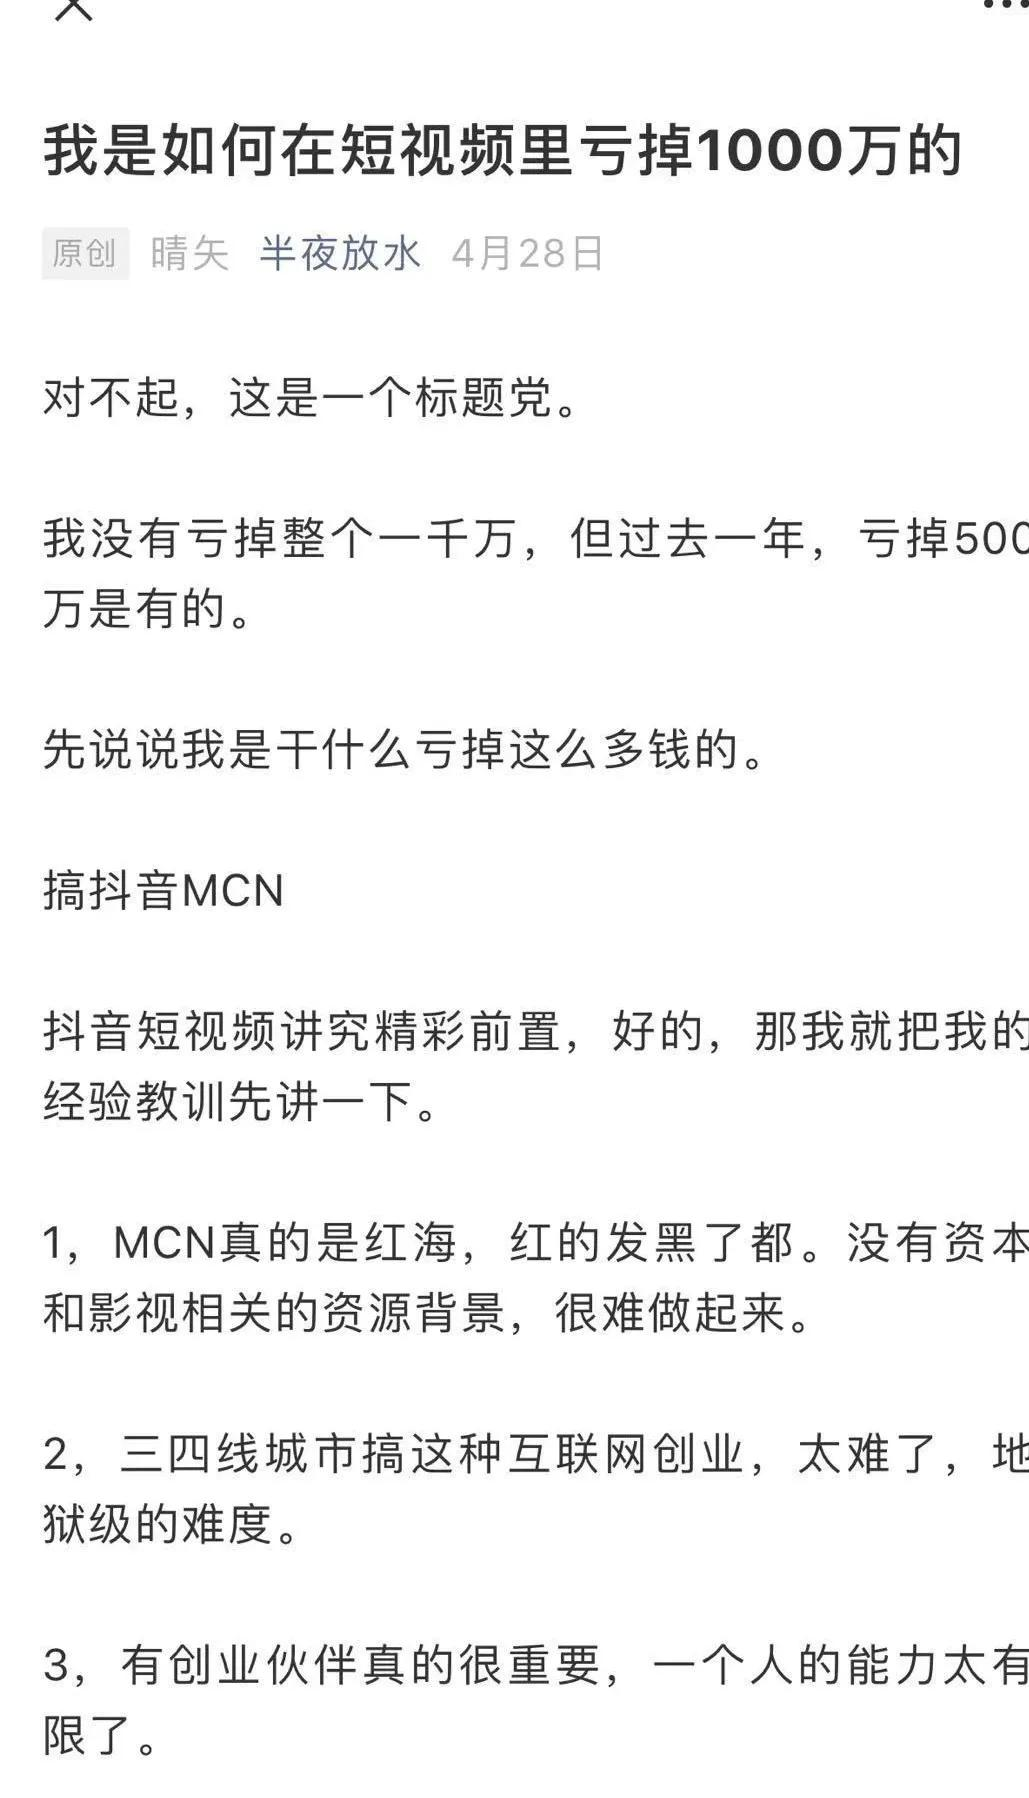 mcn是什么意思(mcn机构是什么)